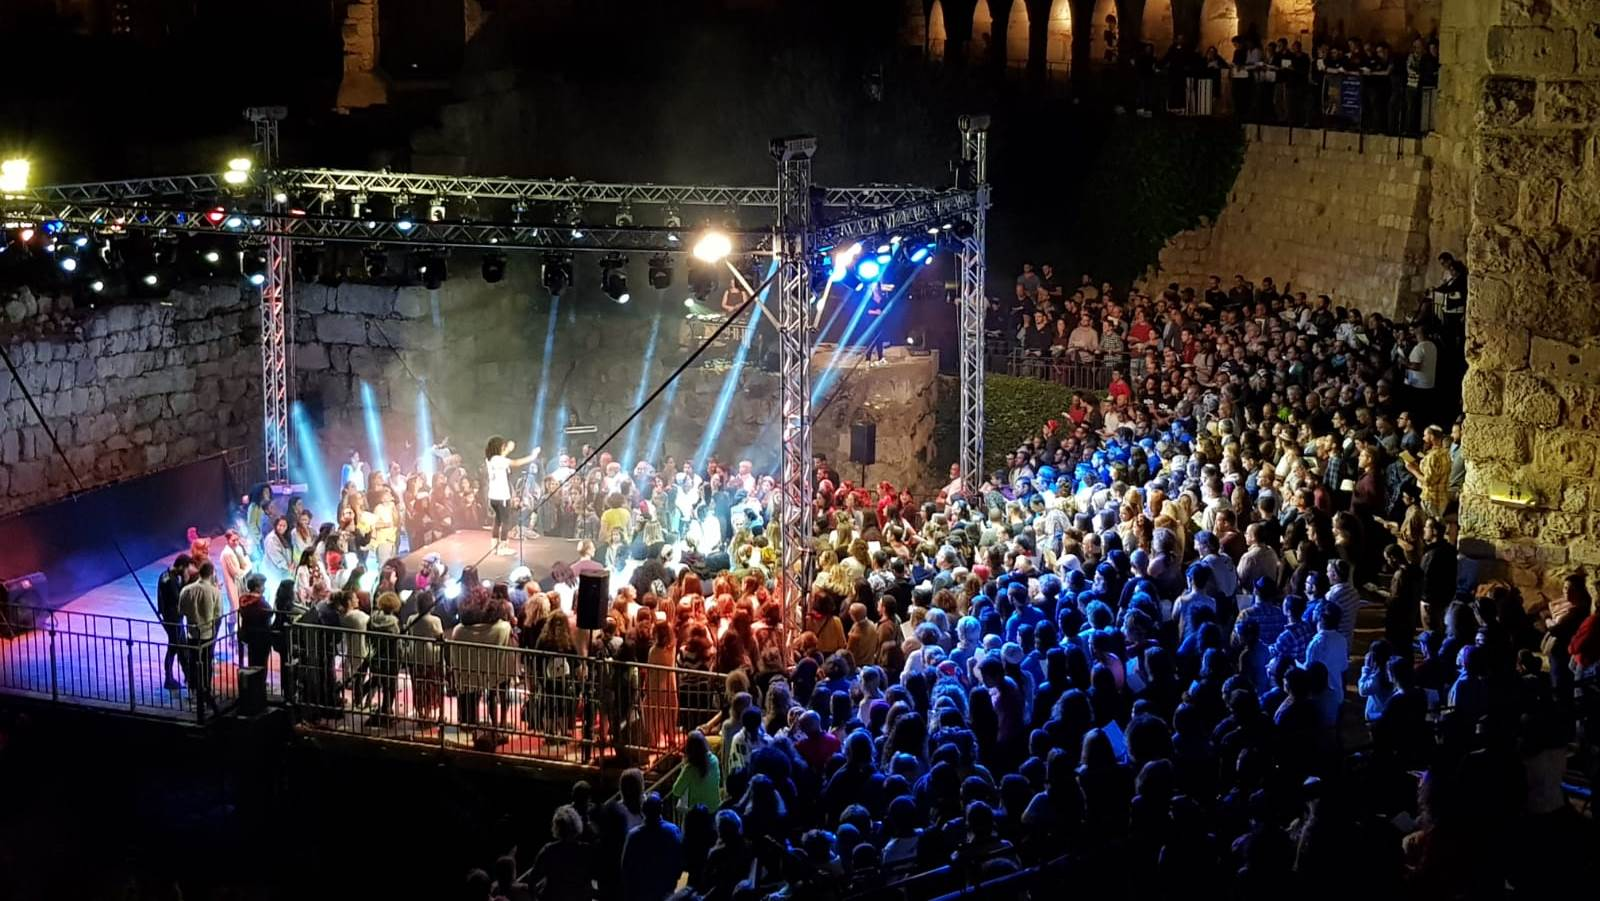 800 Jews, Christians, Muslims sing 'One Love' in Jerusalem